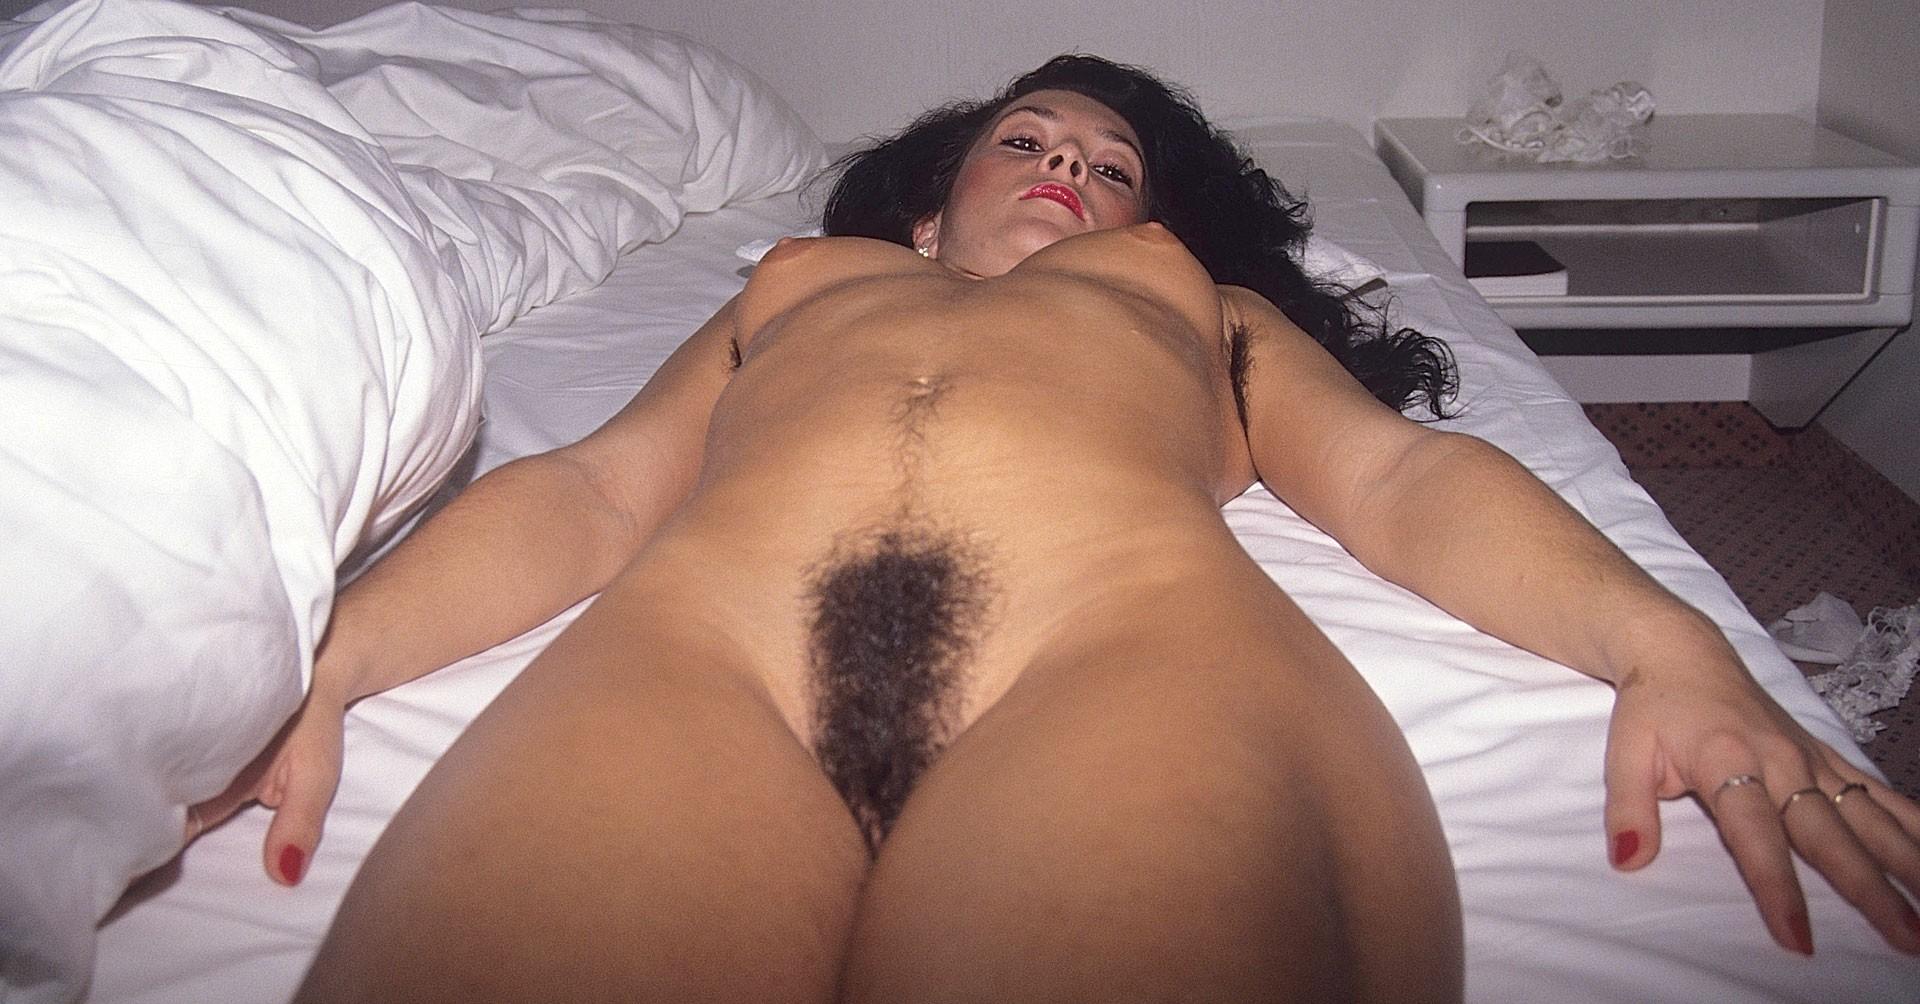 muschis rasieren